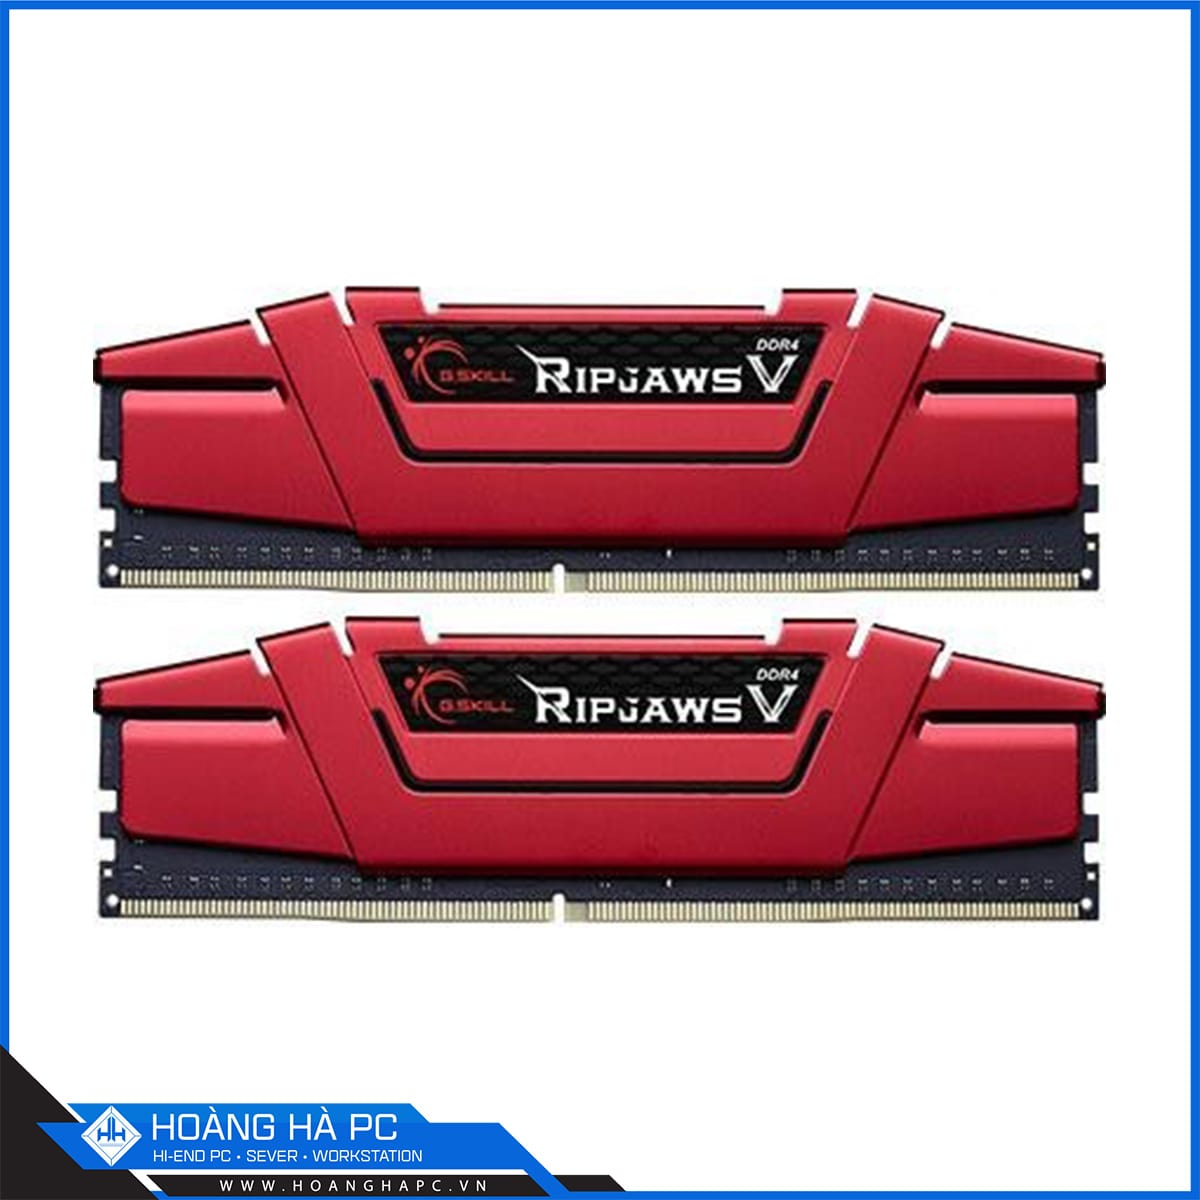 RAM G.SKILL RIPJAWS V 32GB (2x16GB